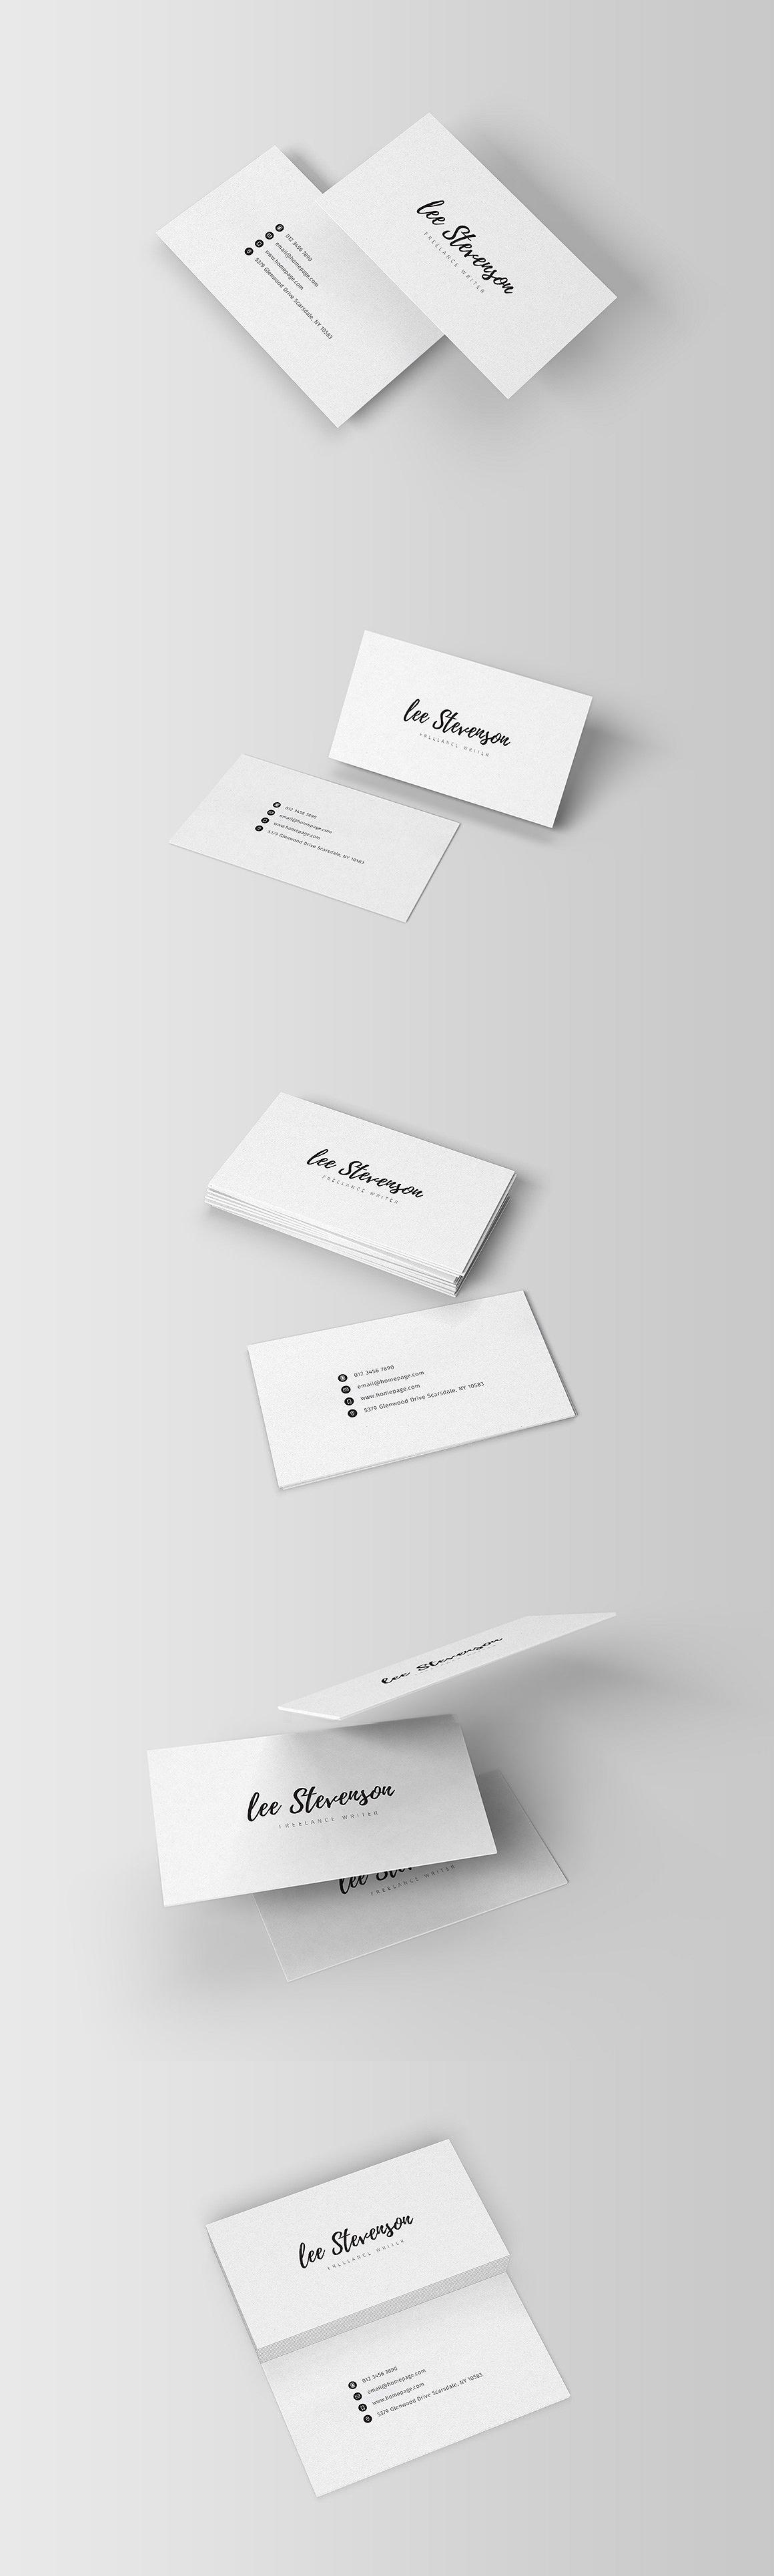 Freelancer business card template ai psd business card templates freelancer business card template ai psd cheaphphosting Images